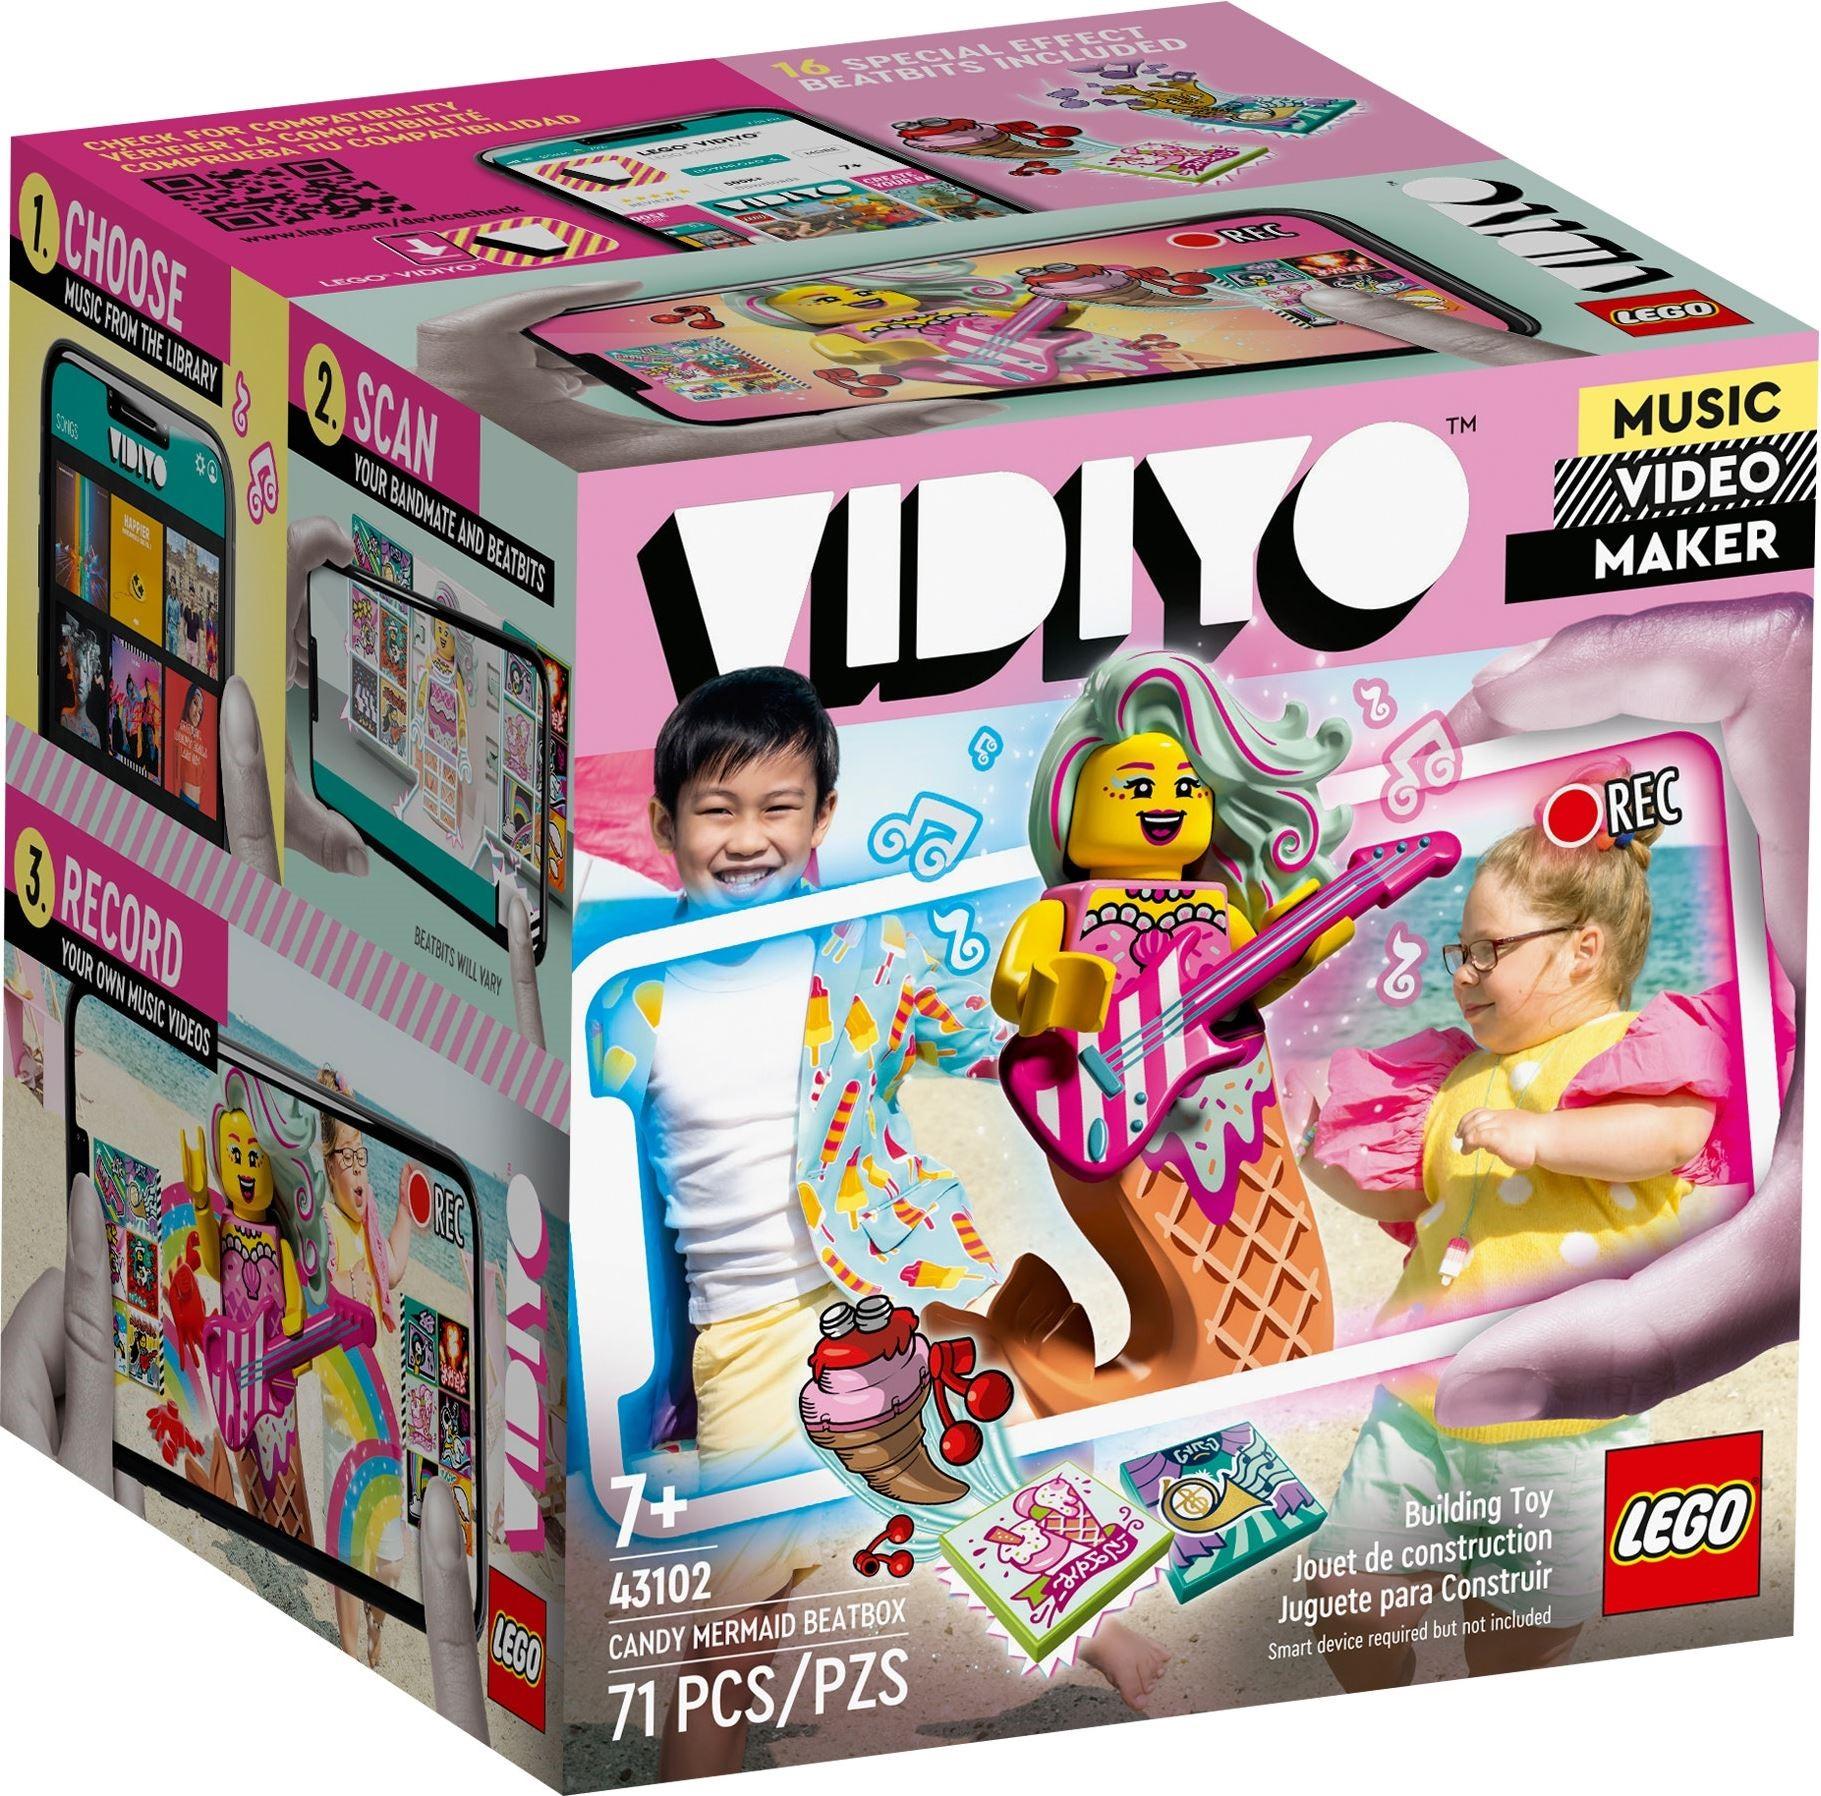 LEGO VIDIYO - Candy Mermaid BeatBox (43102)